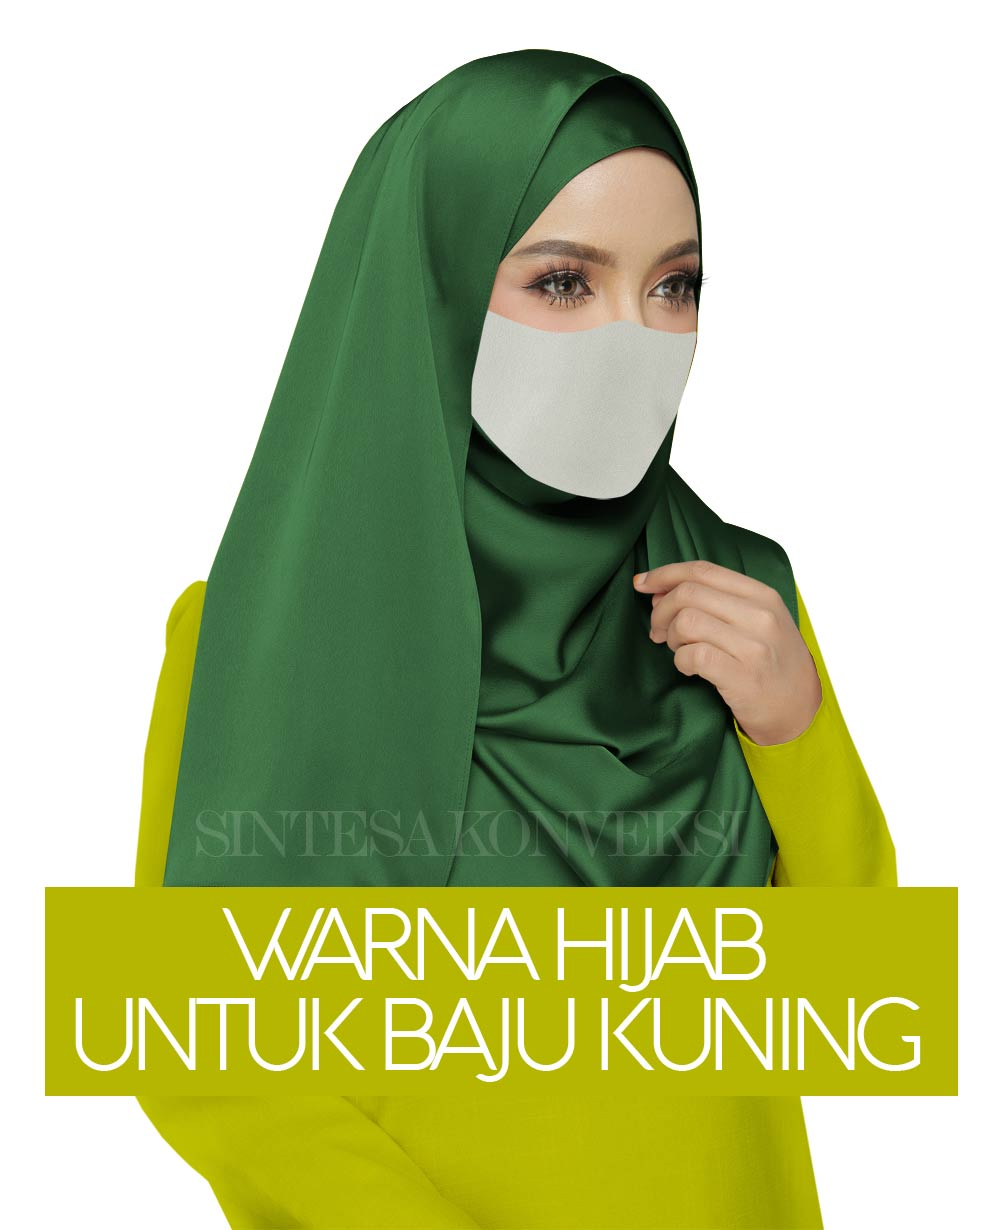 baju kuning cocok dengan jilbab warna apa 2